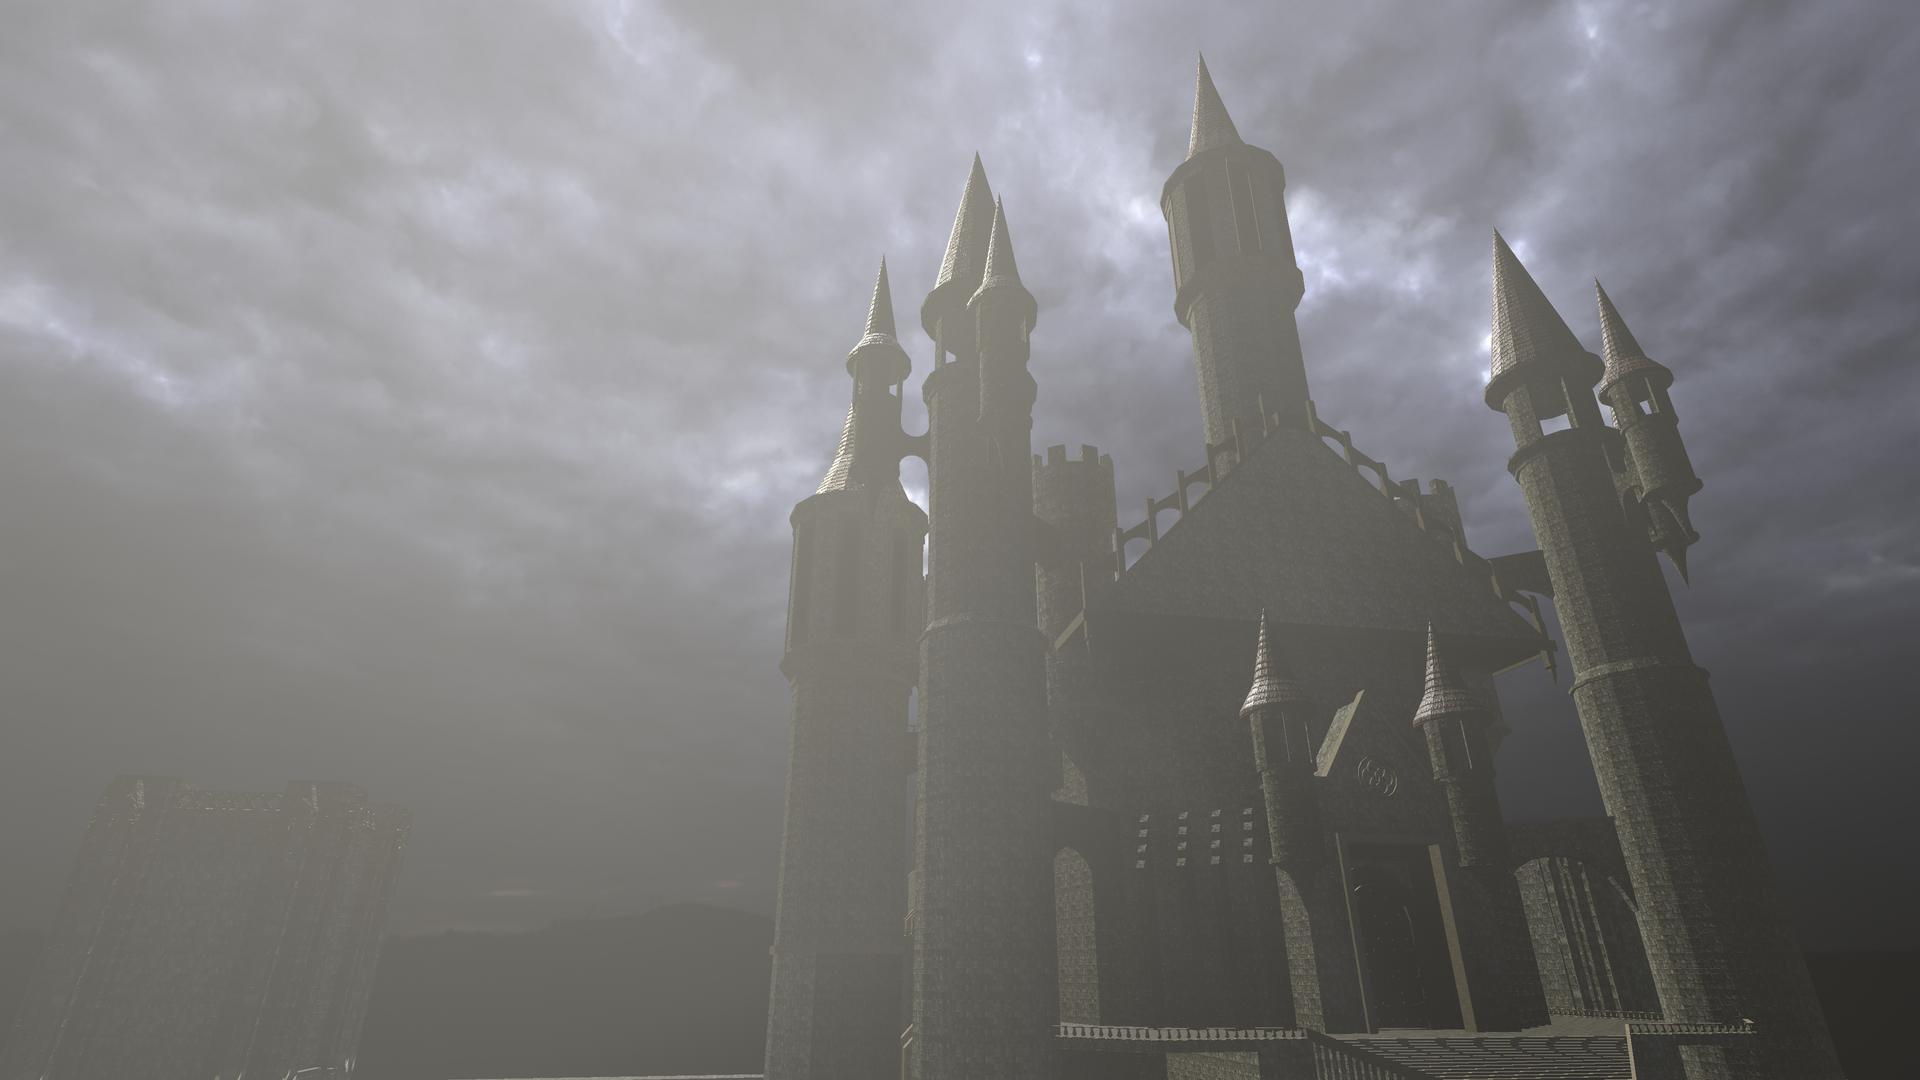 Old King's Castle